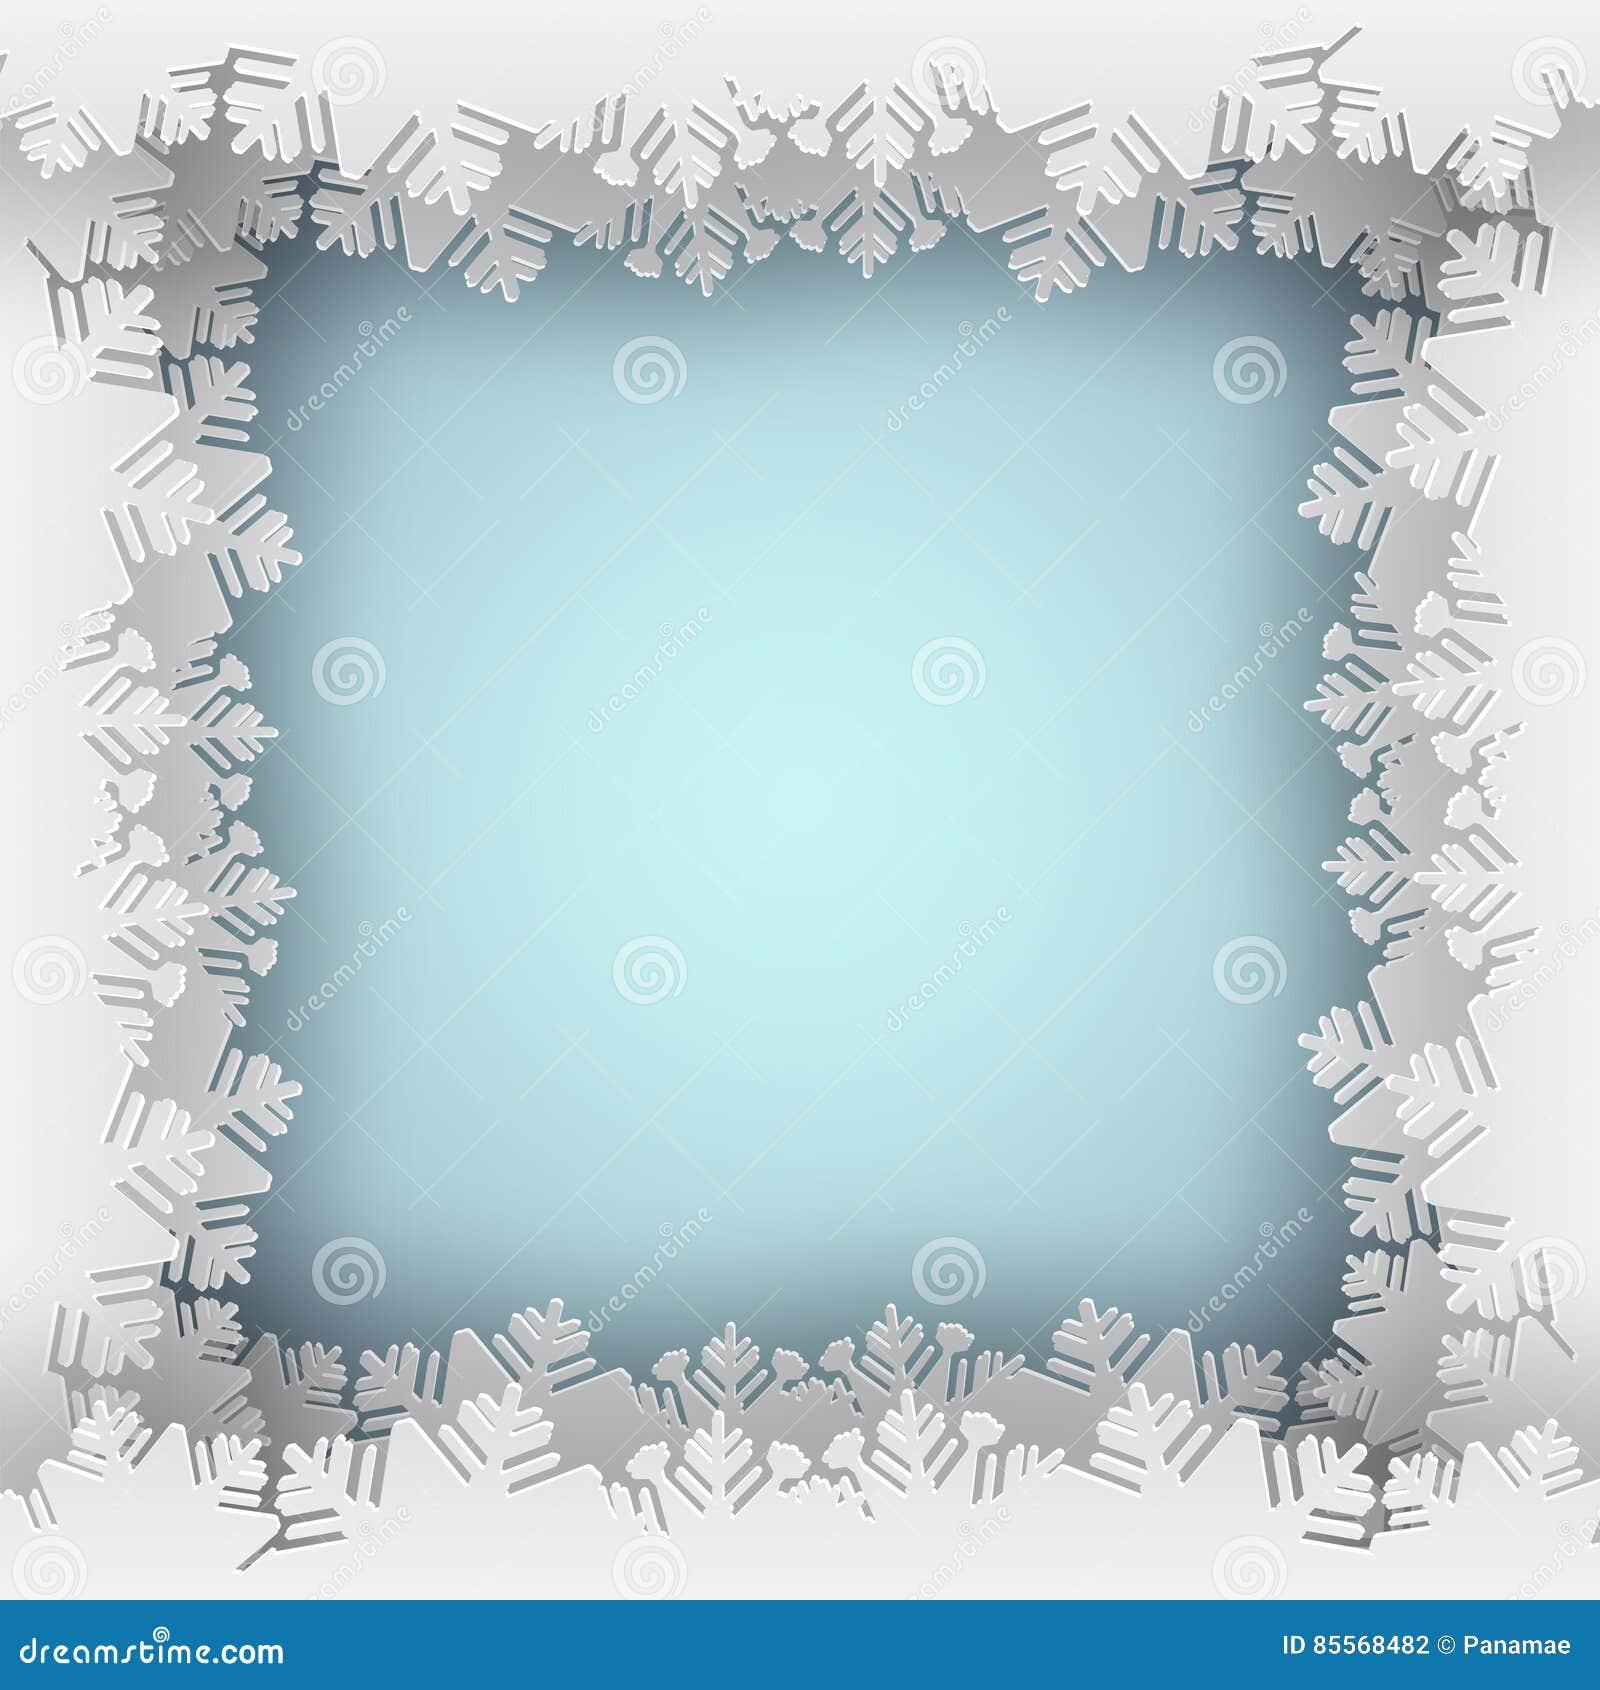 Snowflake blue frame